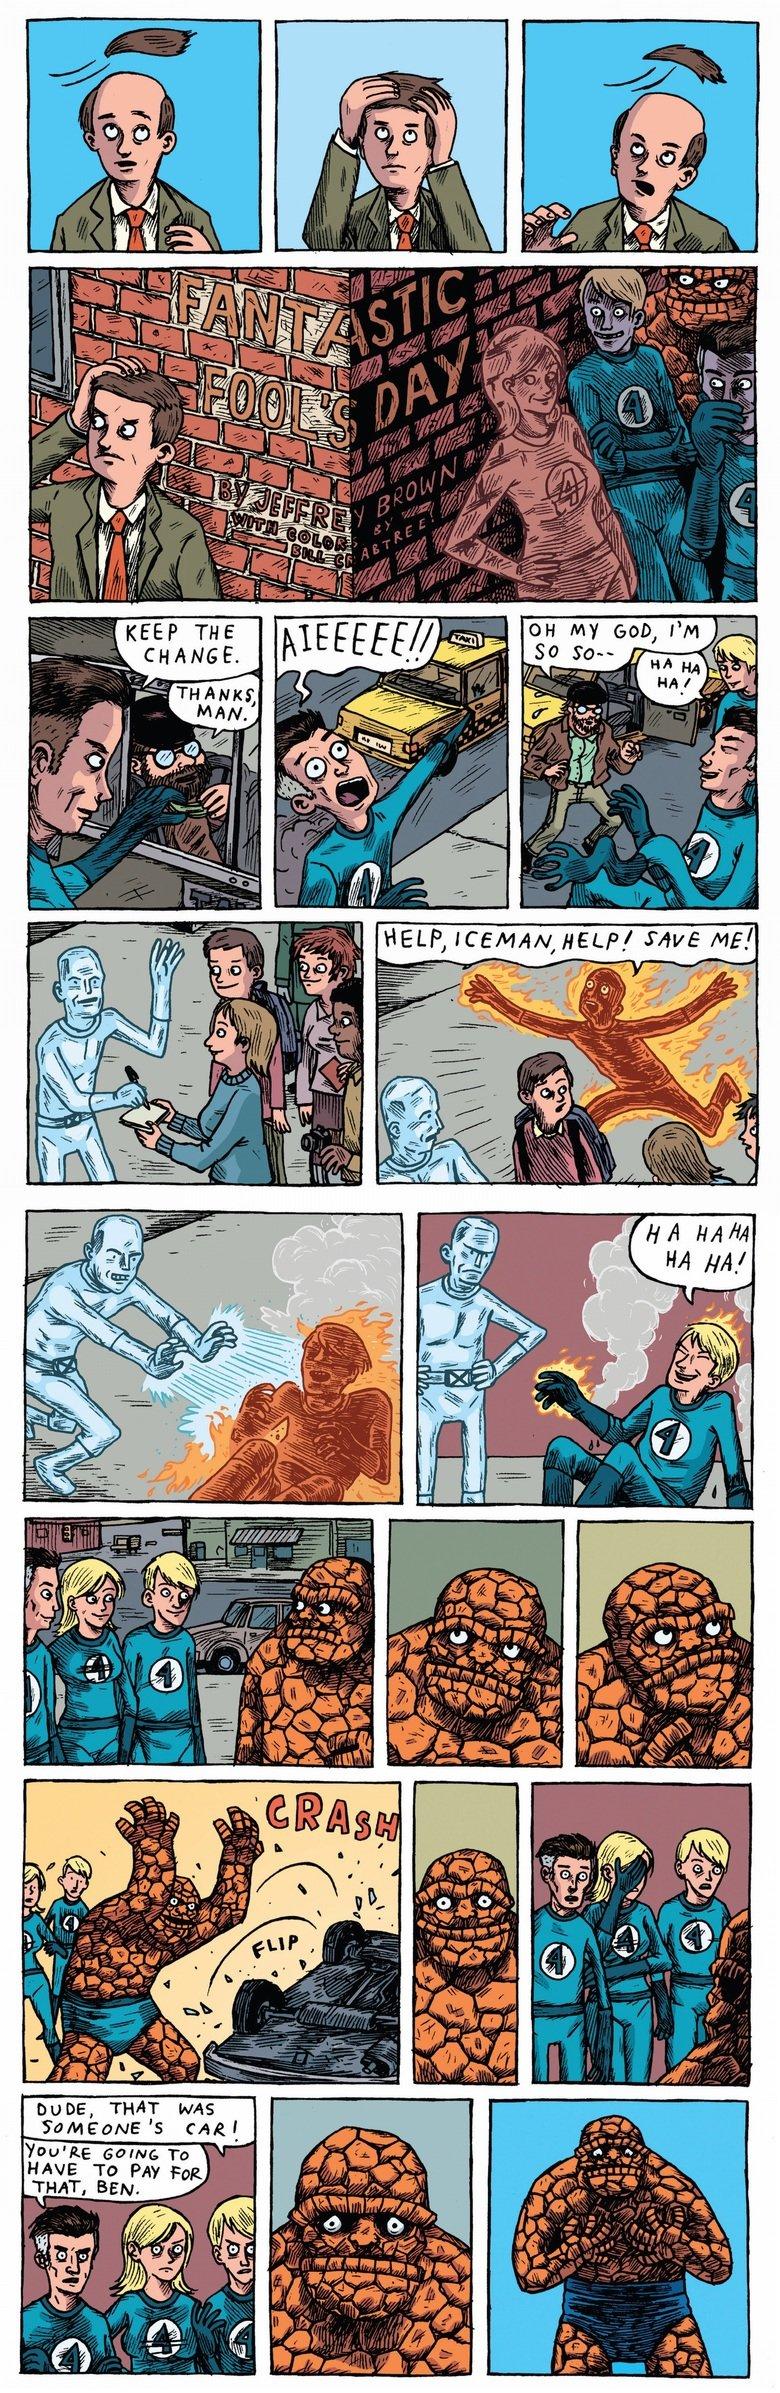 Fantastic four has fun. .. white people